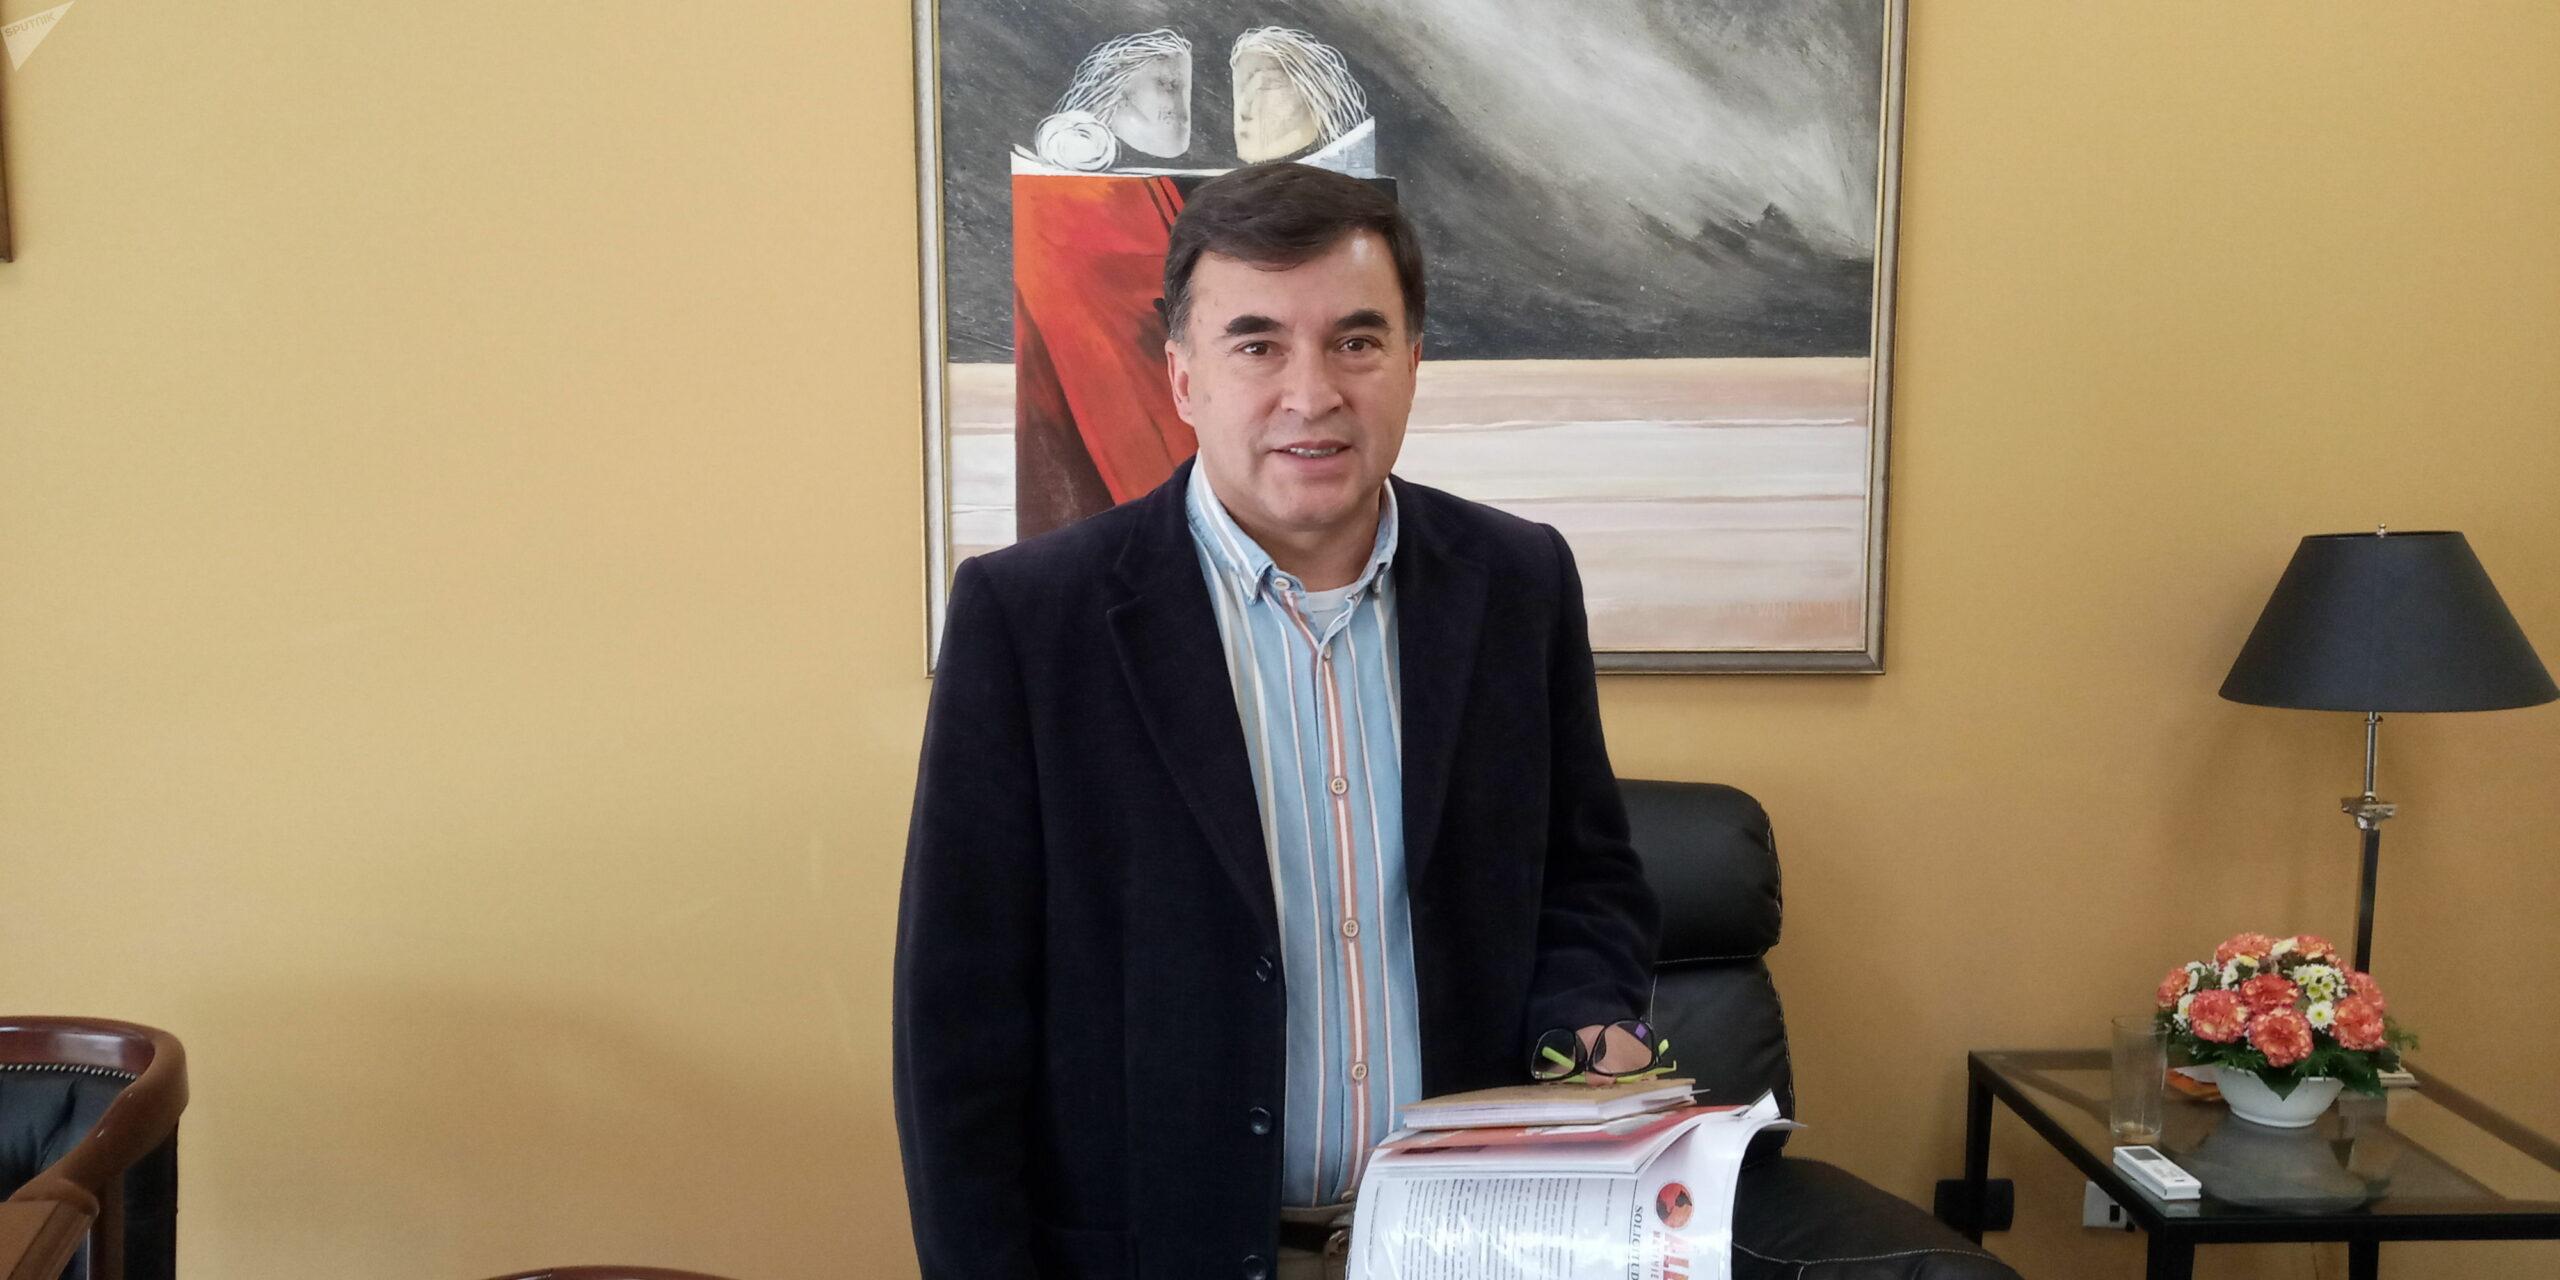 https://i1.wp.com/www.resumen-english.org/wp-content/uploads/2019/12/12-27-bolivia-gra-img.-scaled.jpg?ssl=1